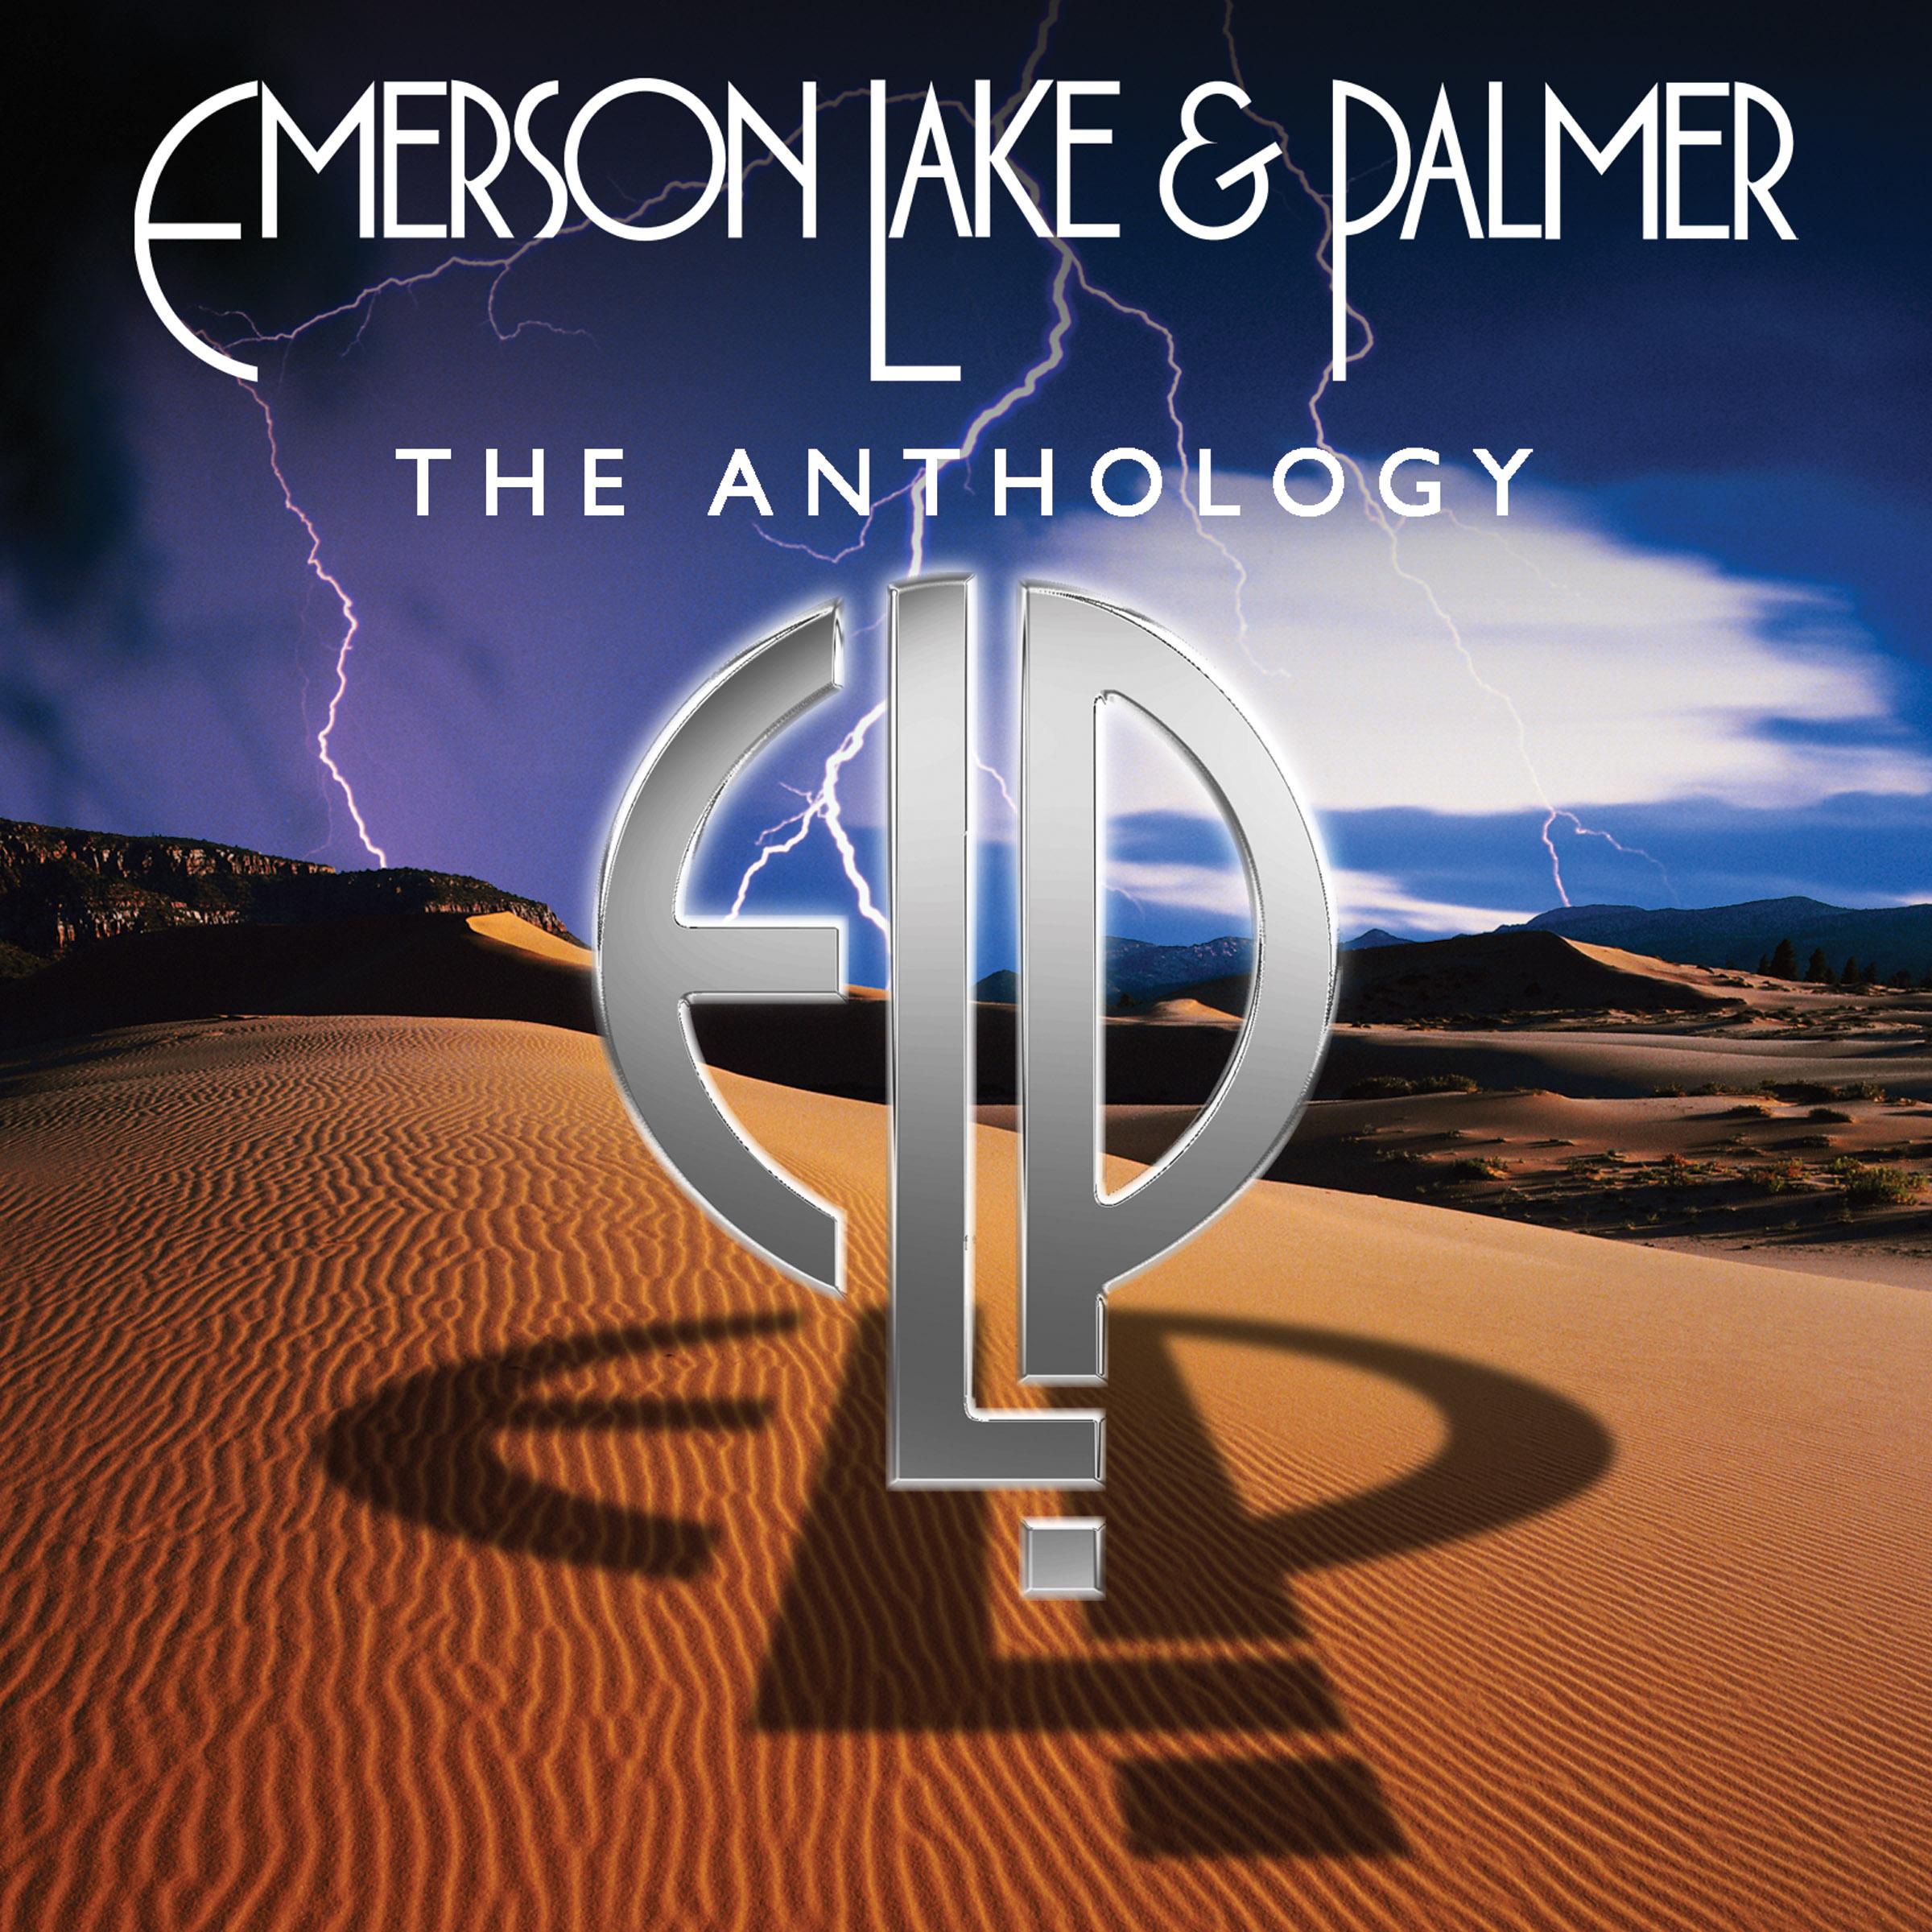 Emerson Lake Palmer In Concert